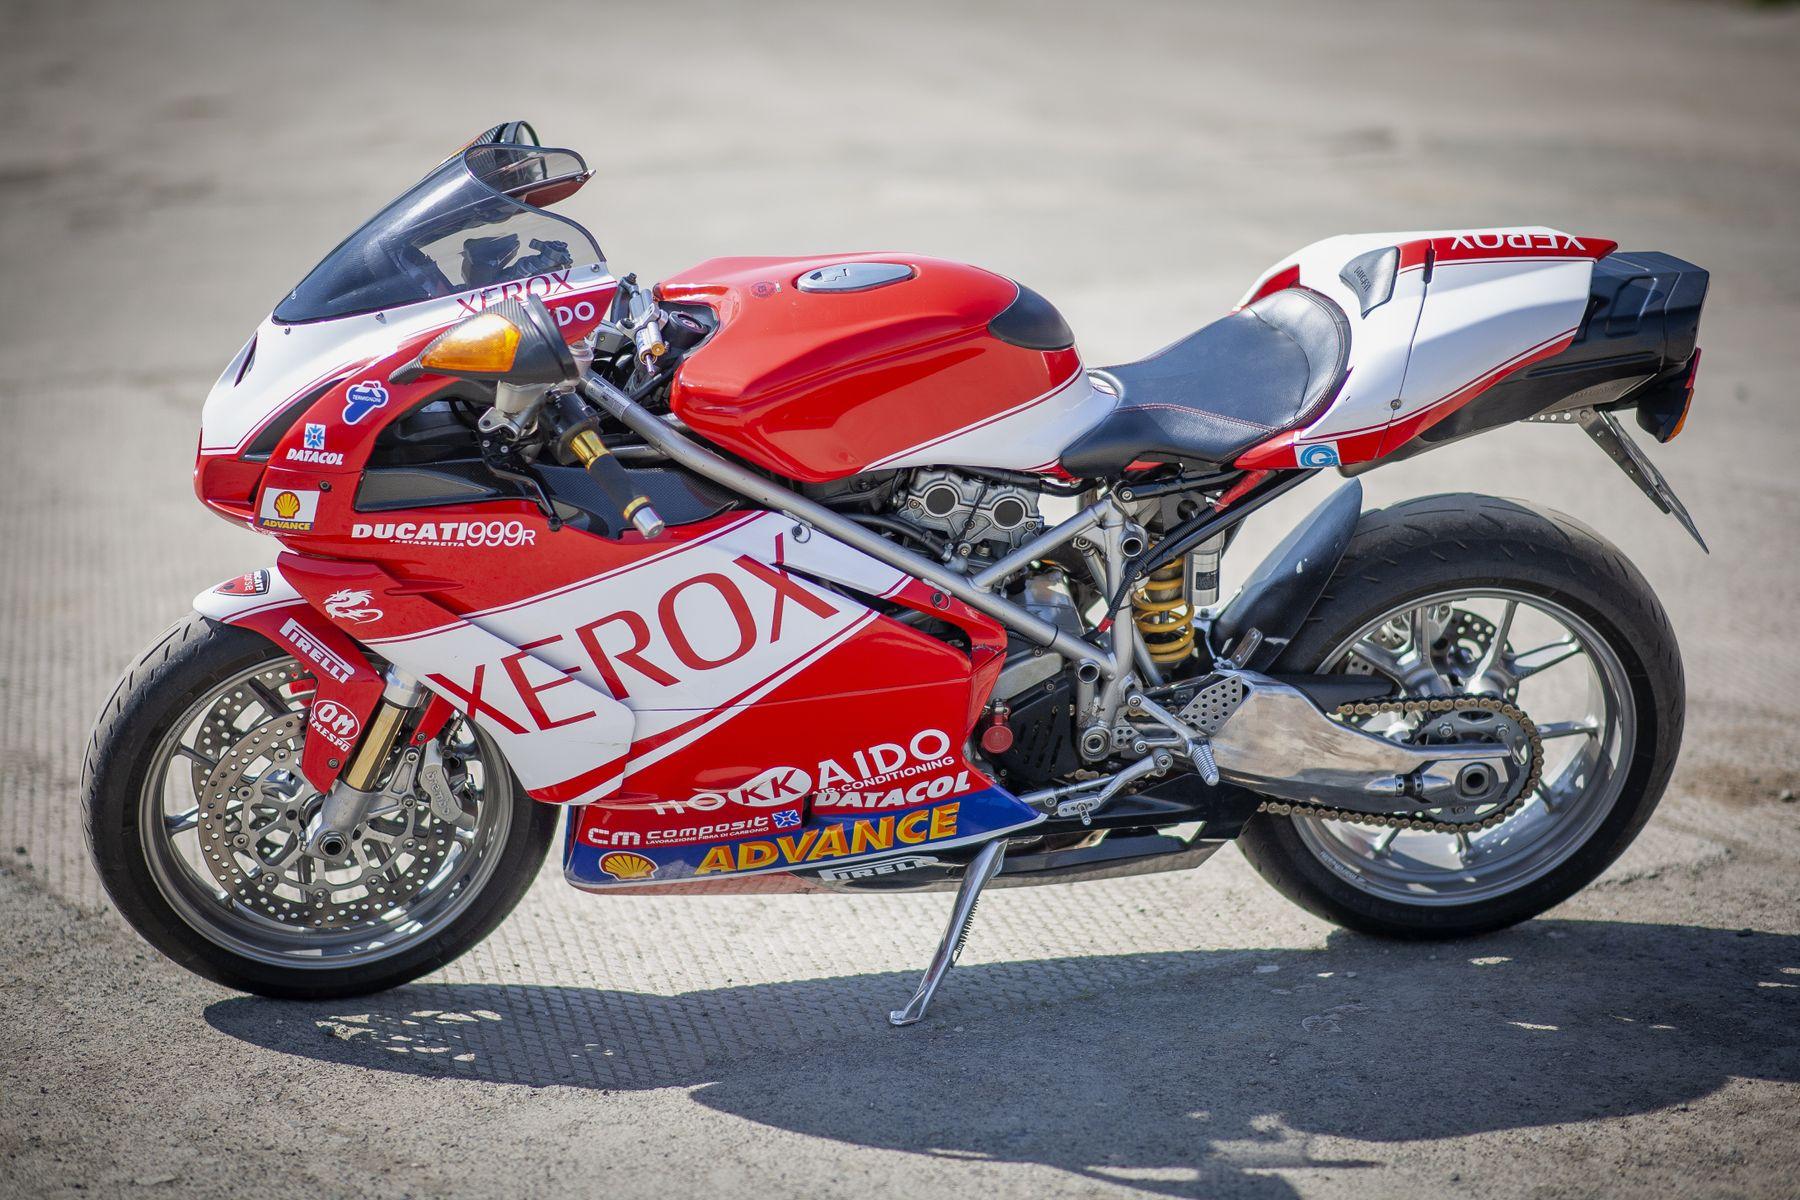 Ducati999R TESTASTRETTA